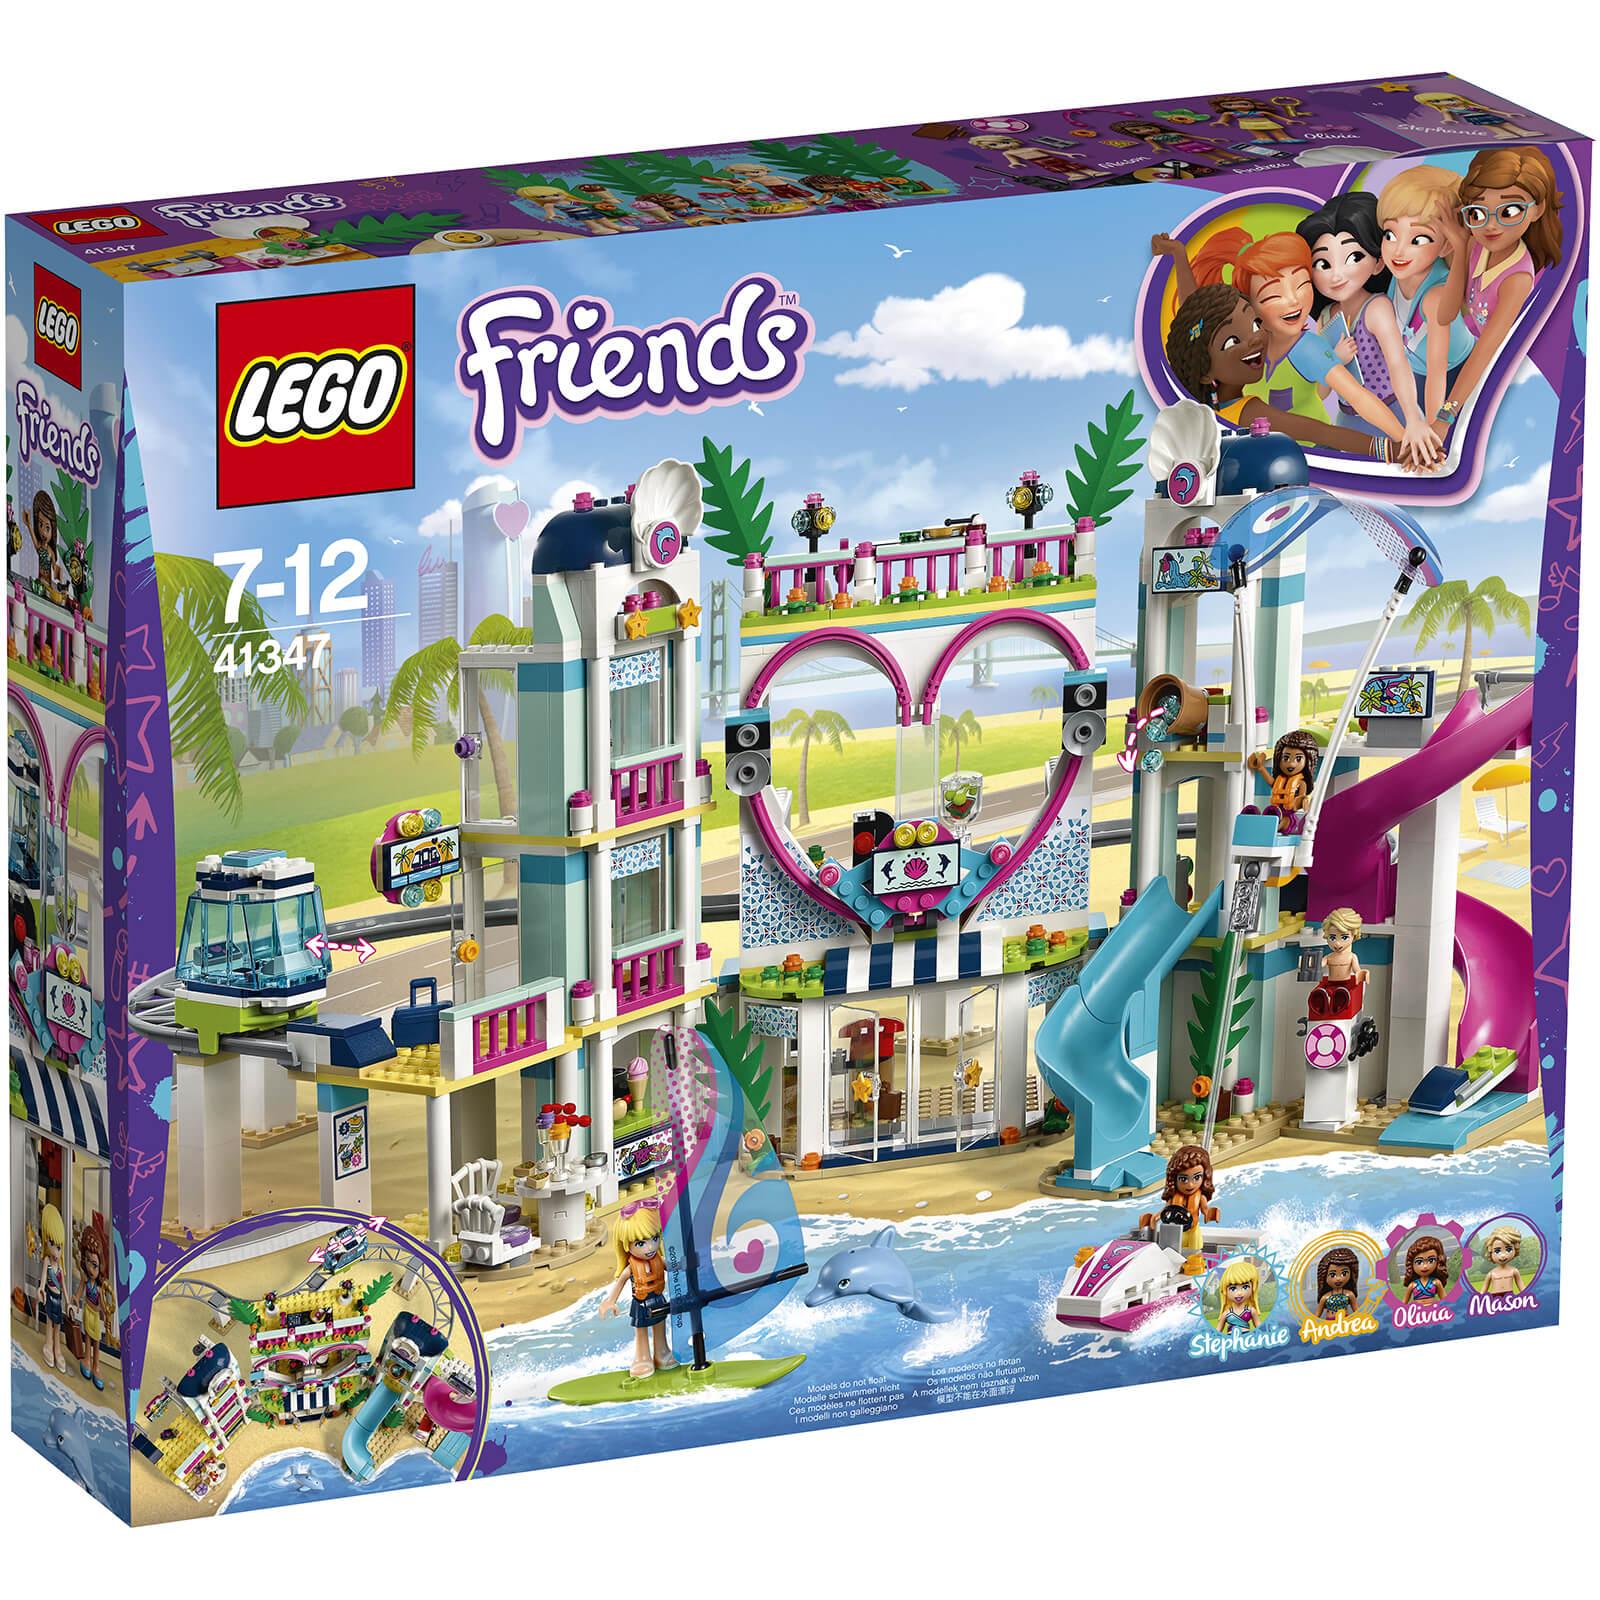 Lego Friends Heartlake City Resort 41347 Toys Zavvi